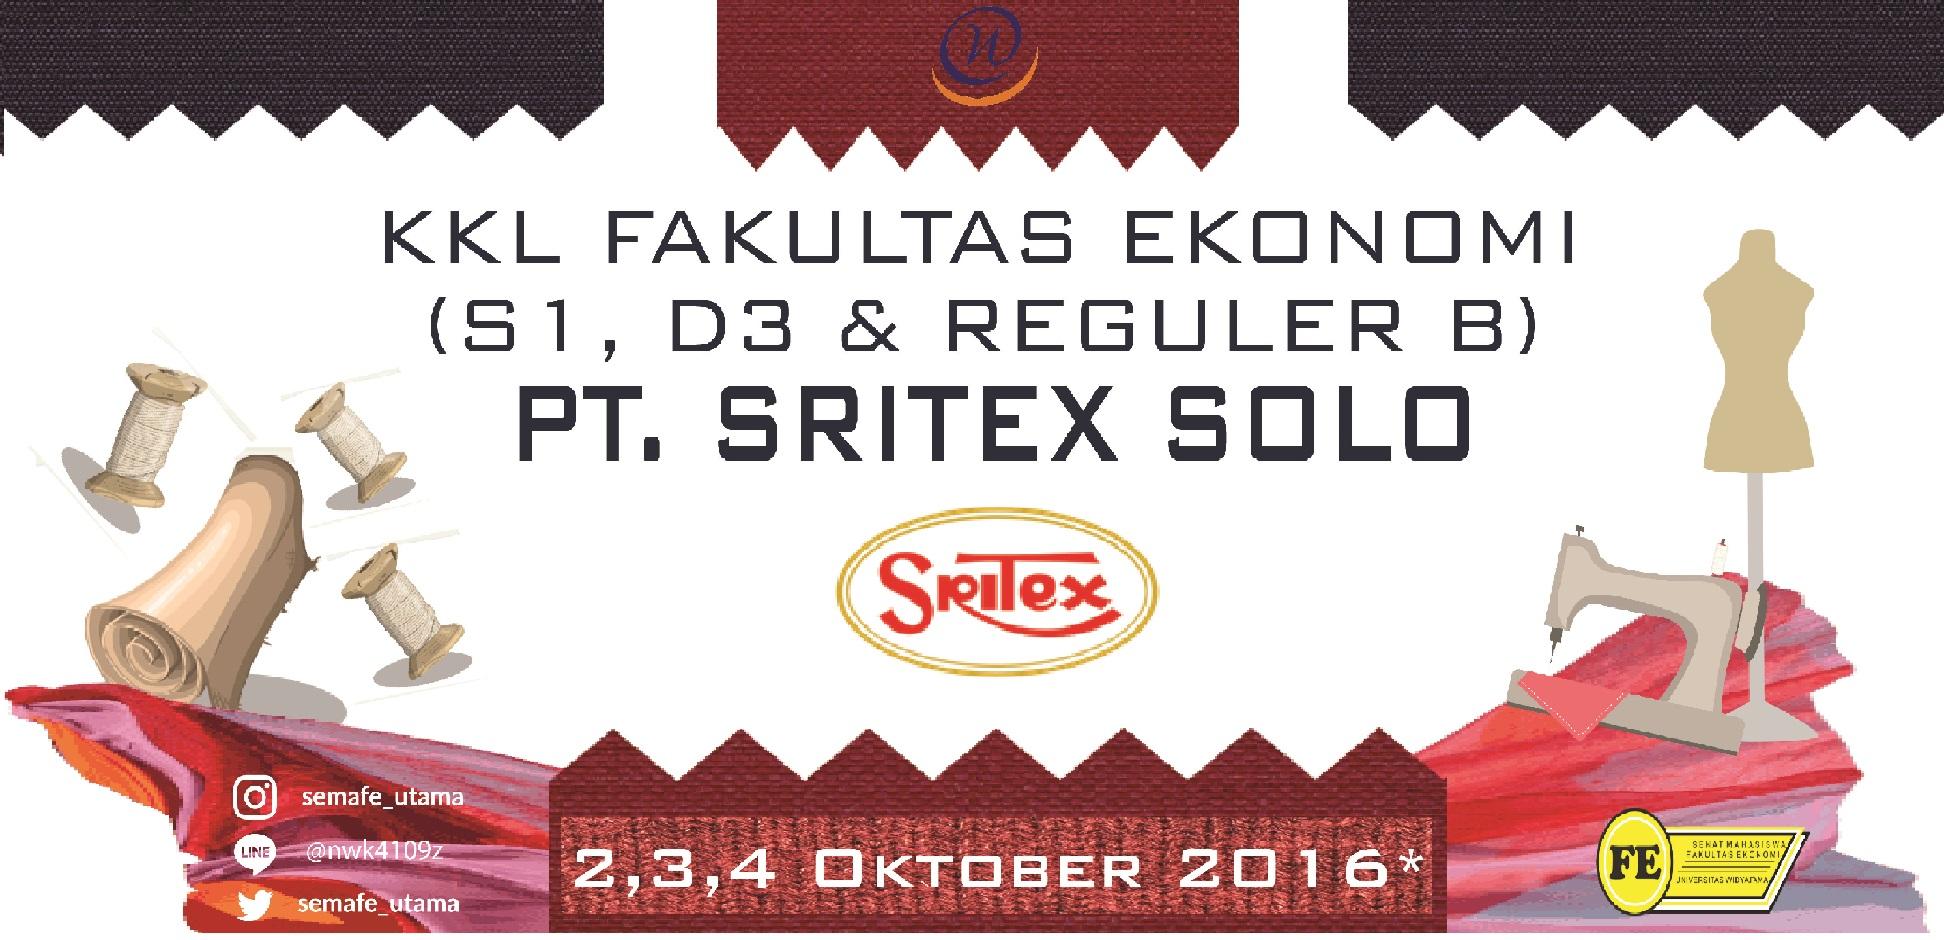 KKL PT. SRITEX SOLO